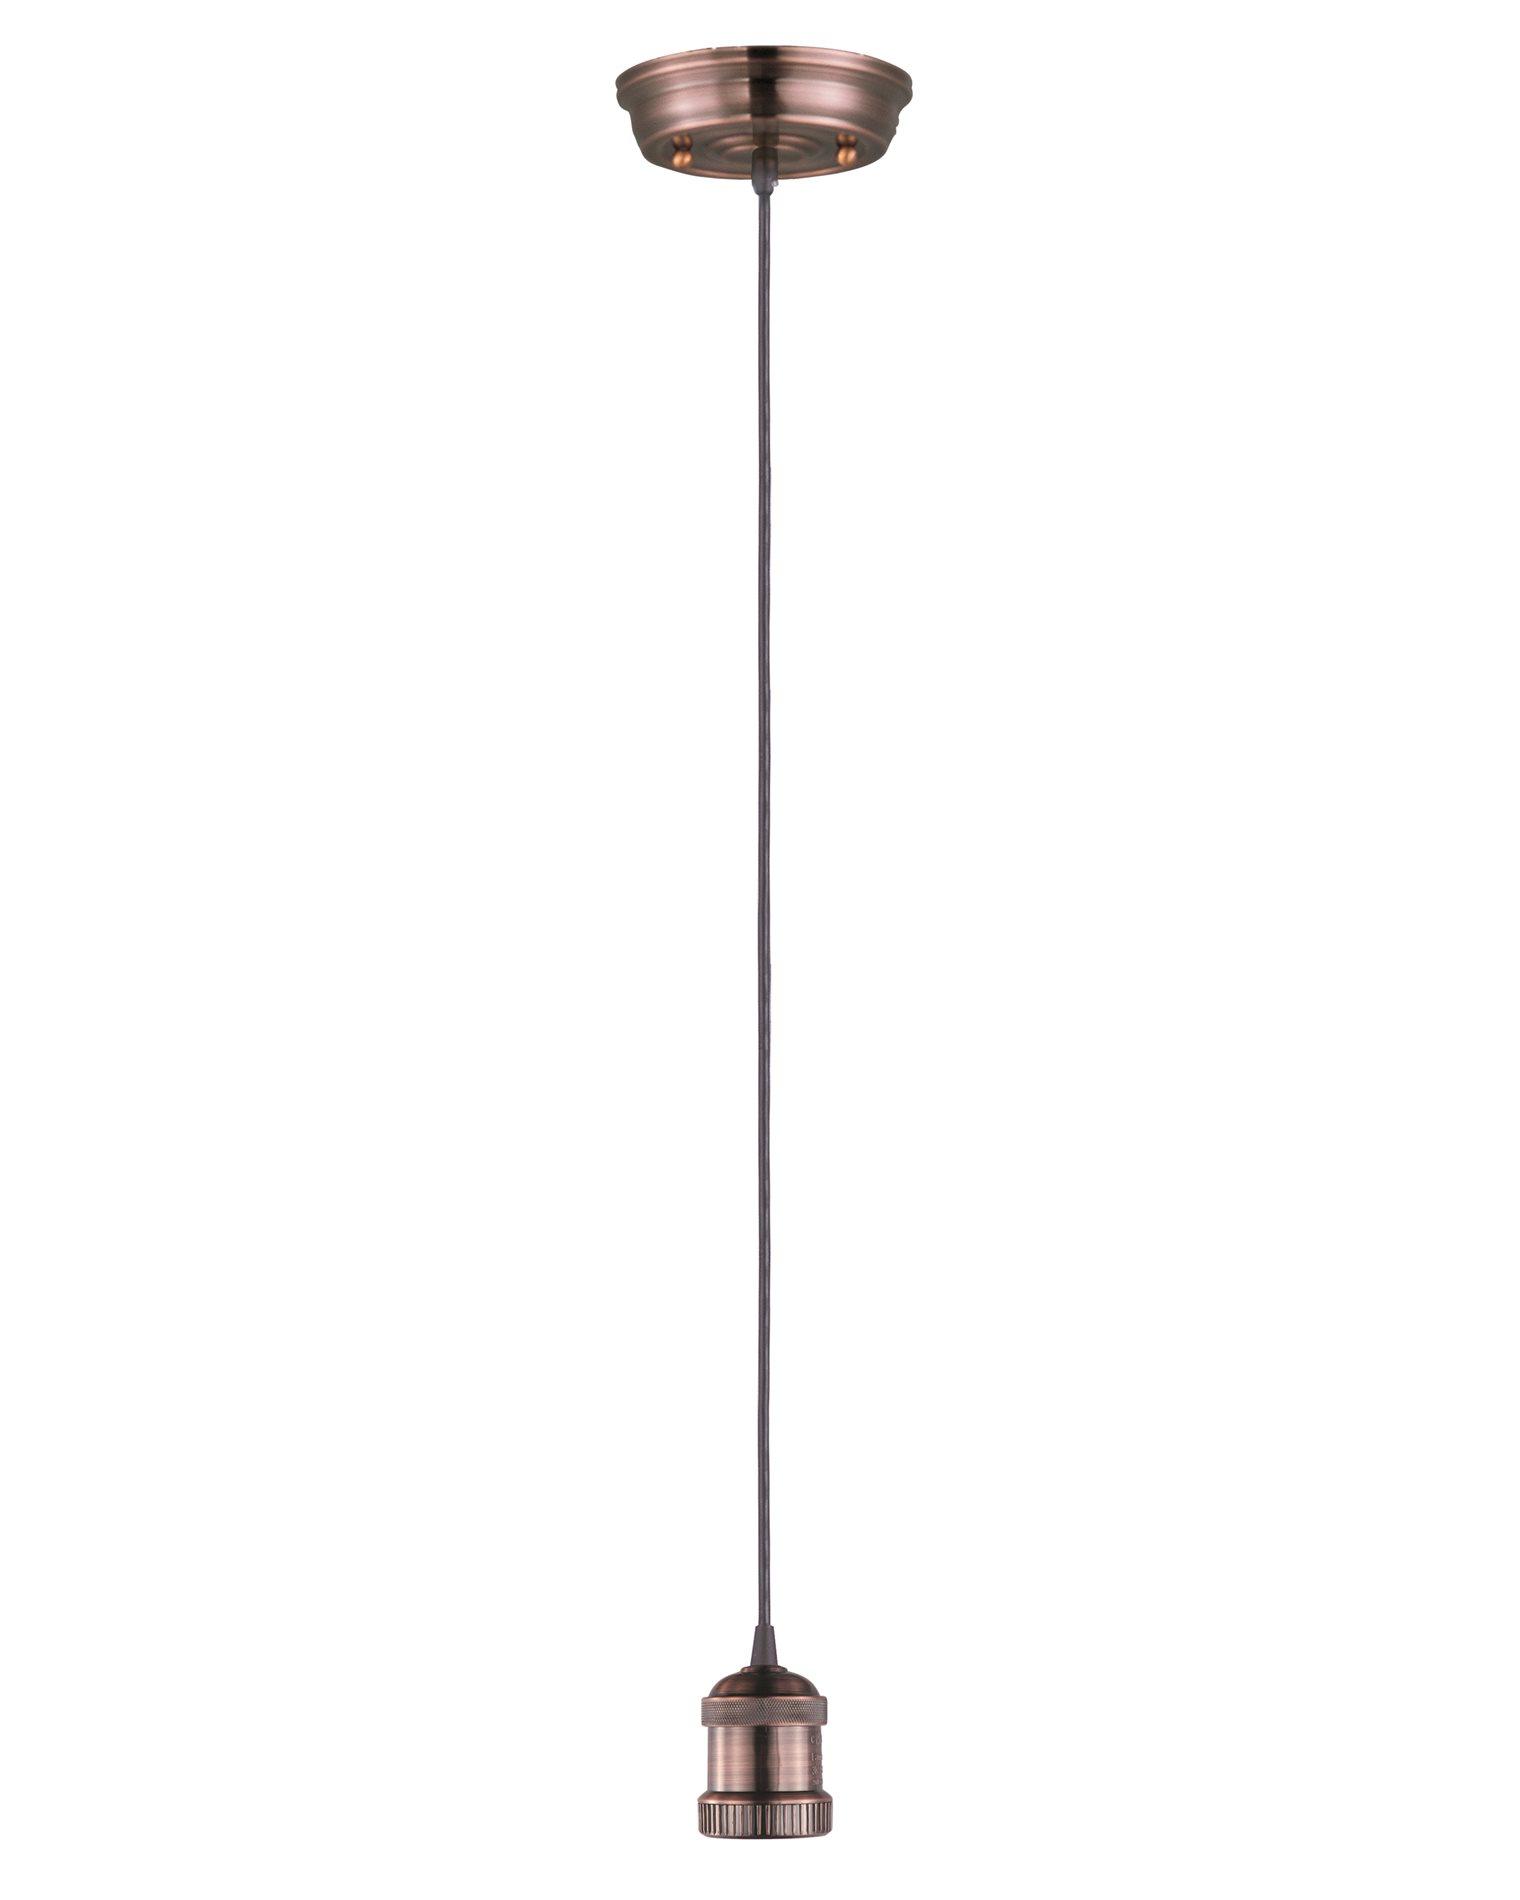 Maxim lighting 25018 mini hi bay mini hi bay 1 light pendant cord acp antique copper bulb not included arubaitofo Image collections